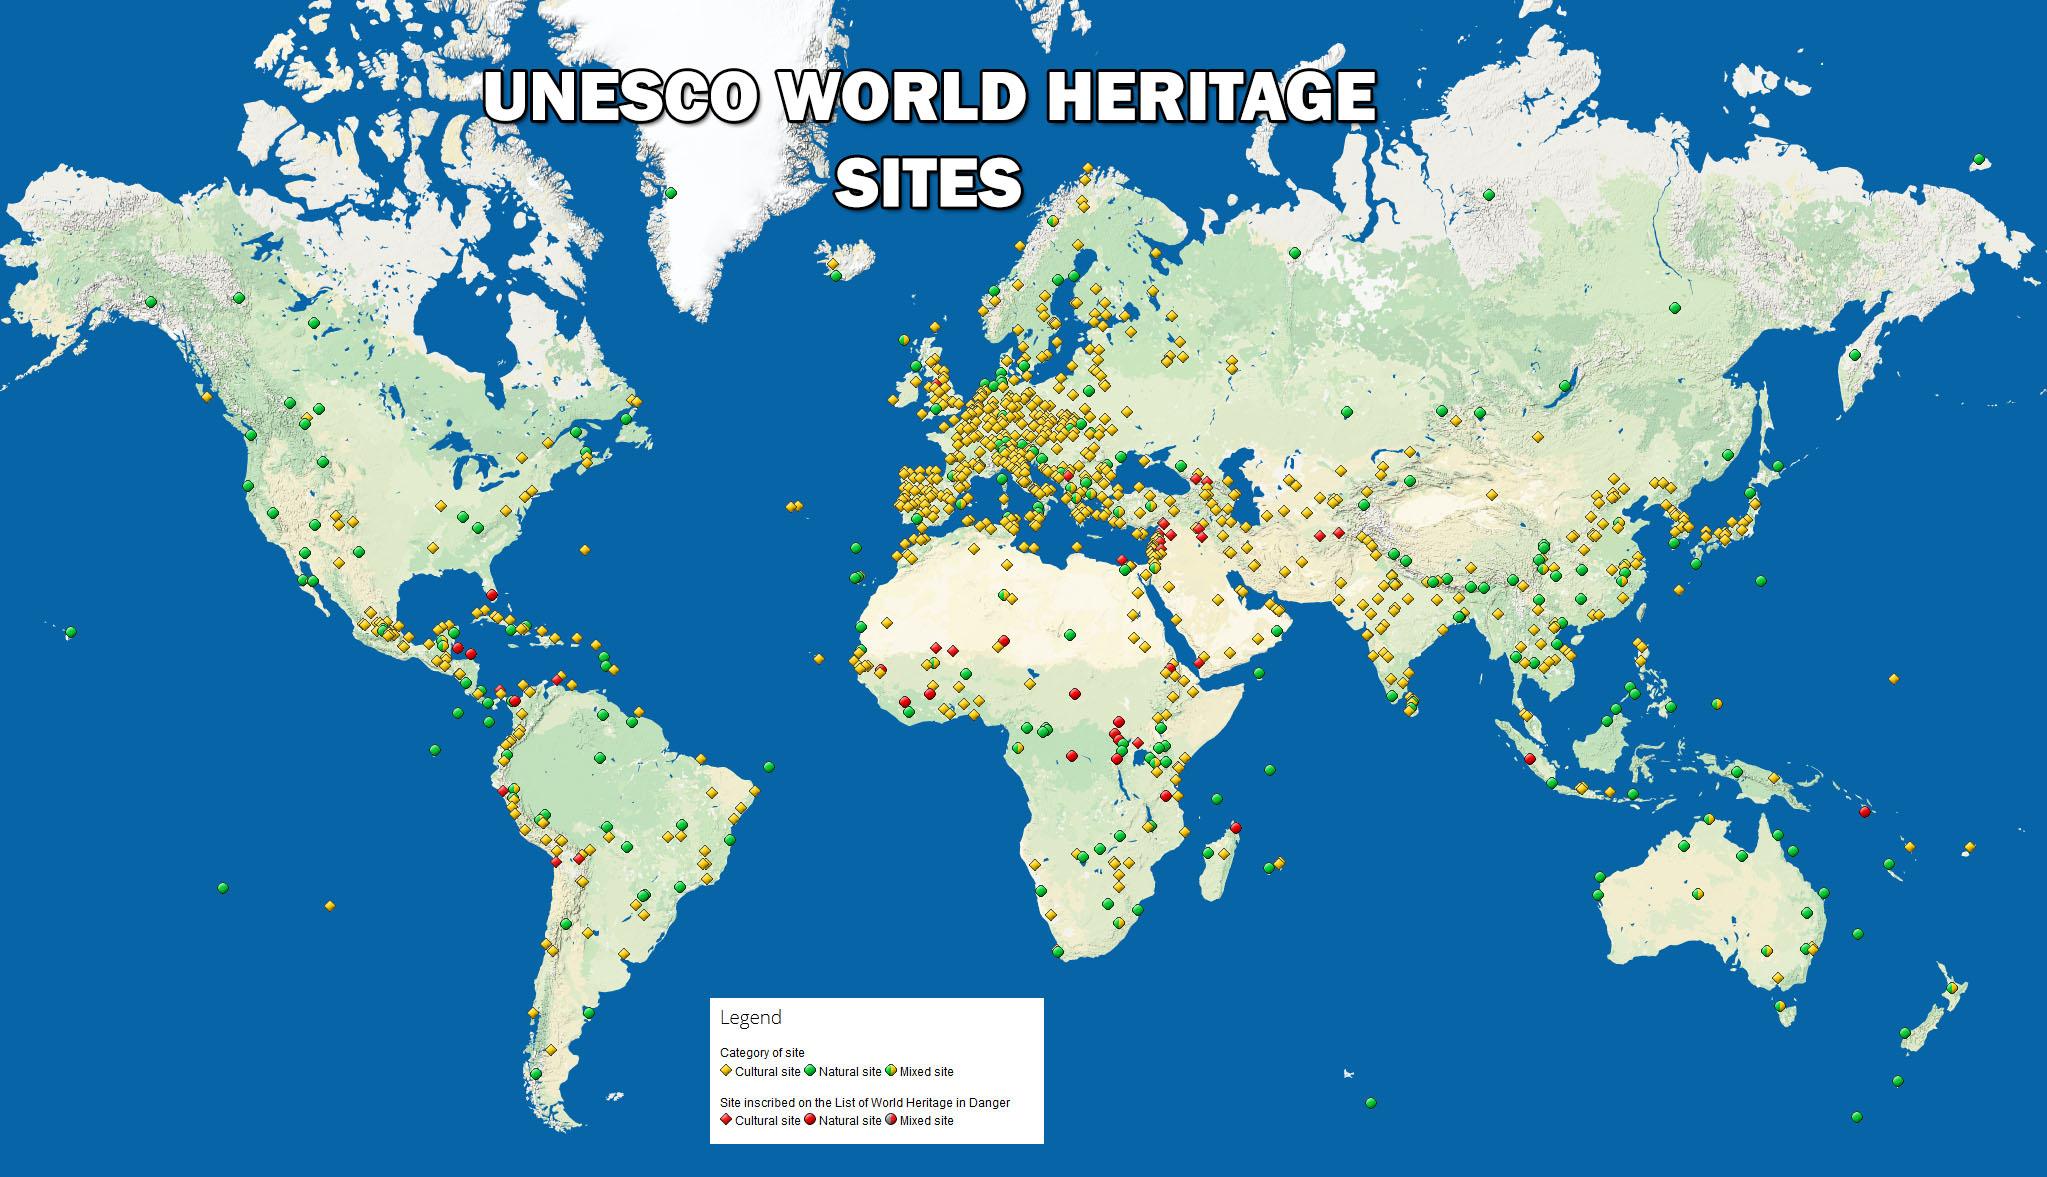 Map of UNESCO World Heritage Sites